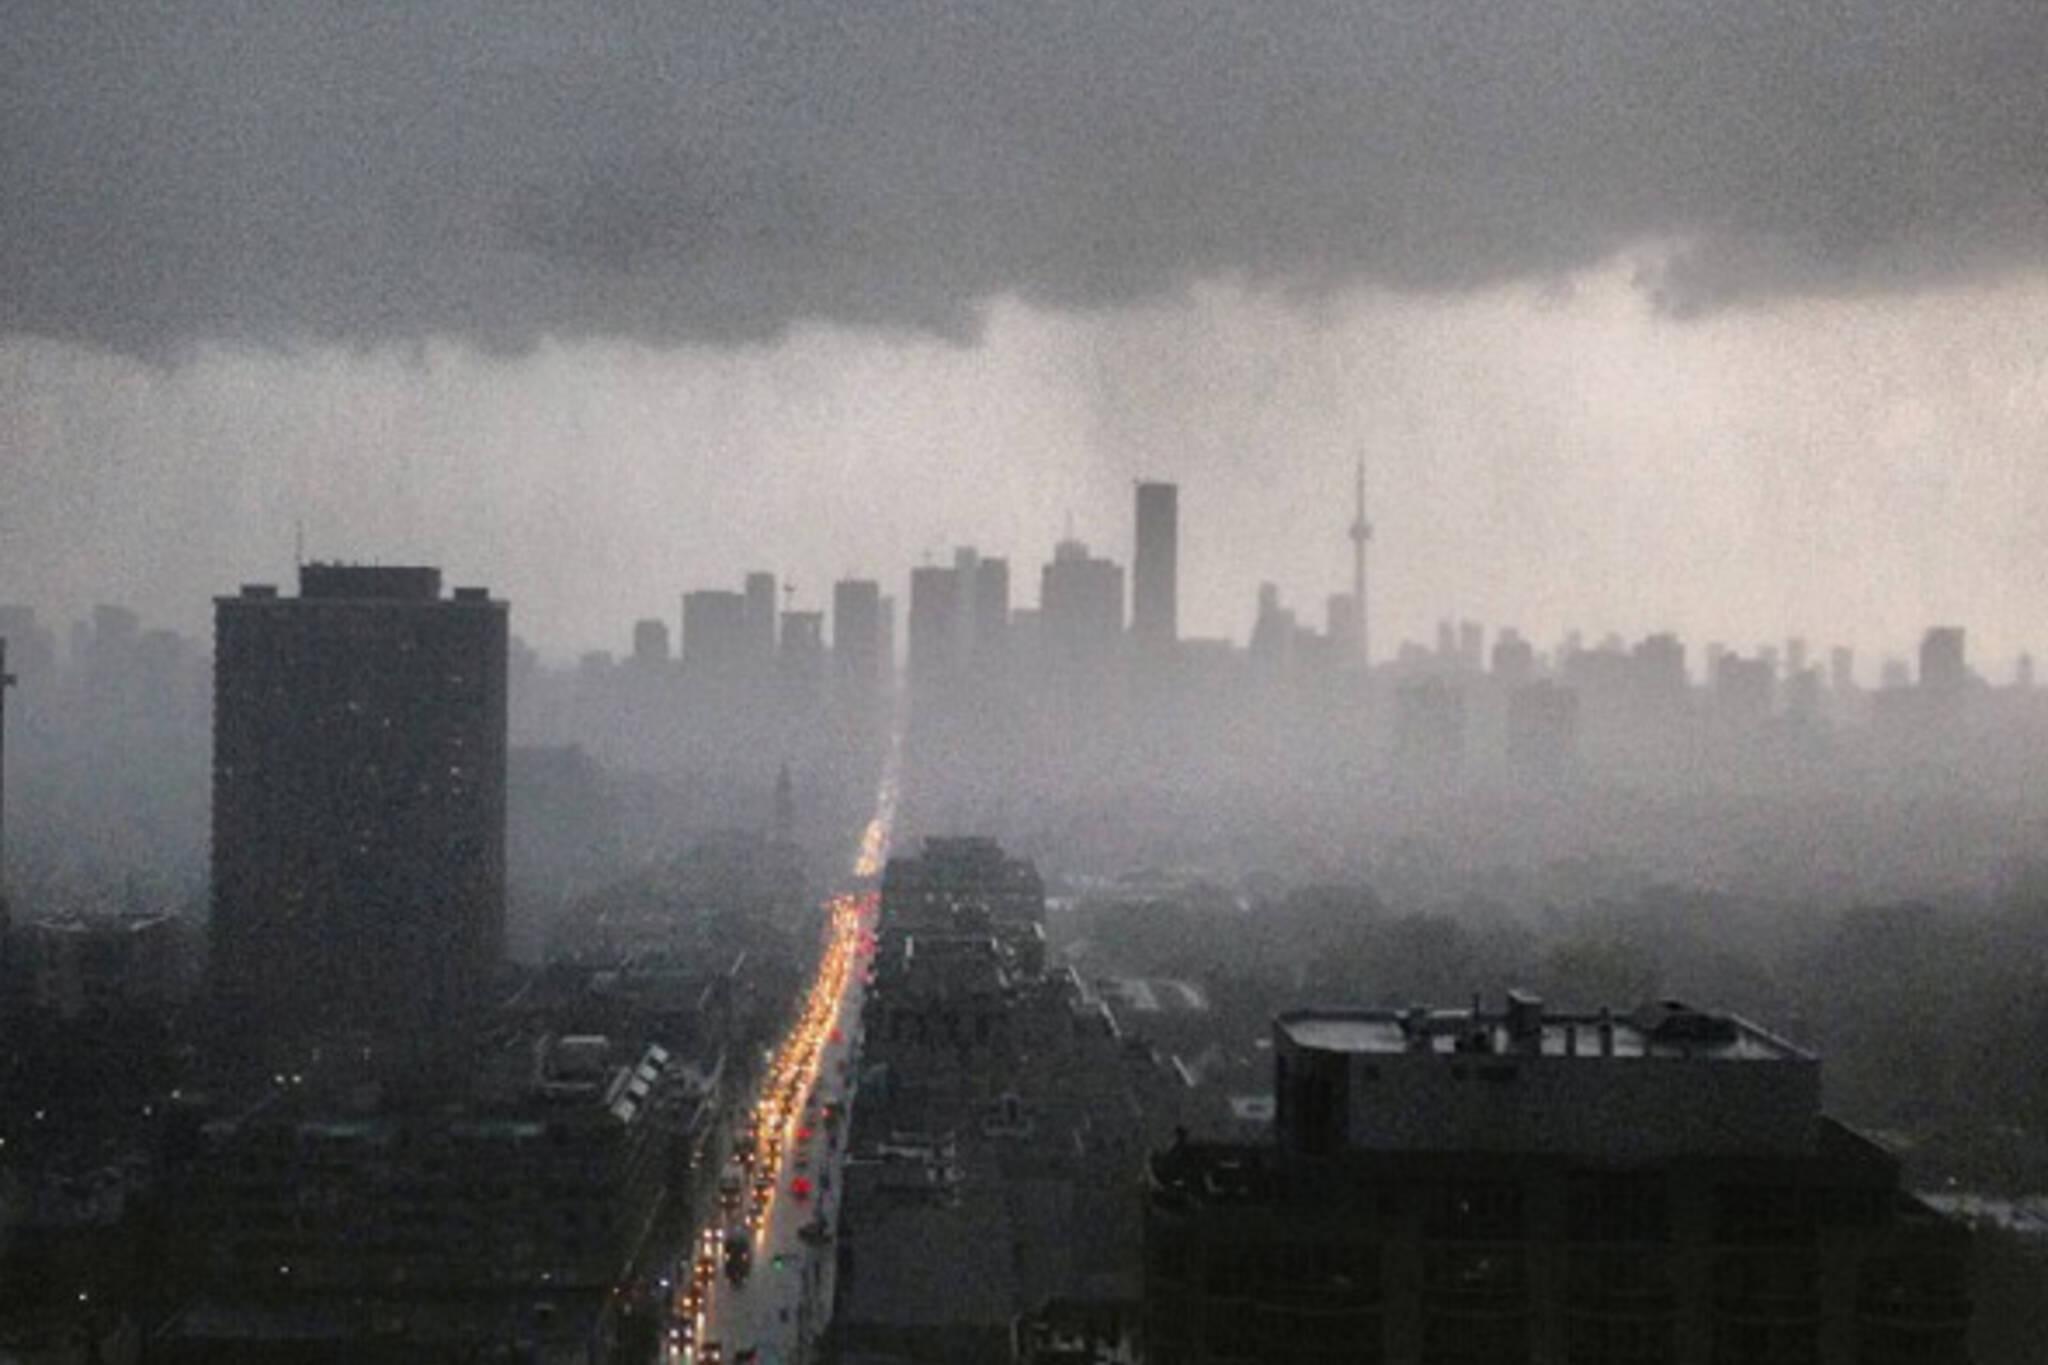 Rain storm toronto july 2013